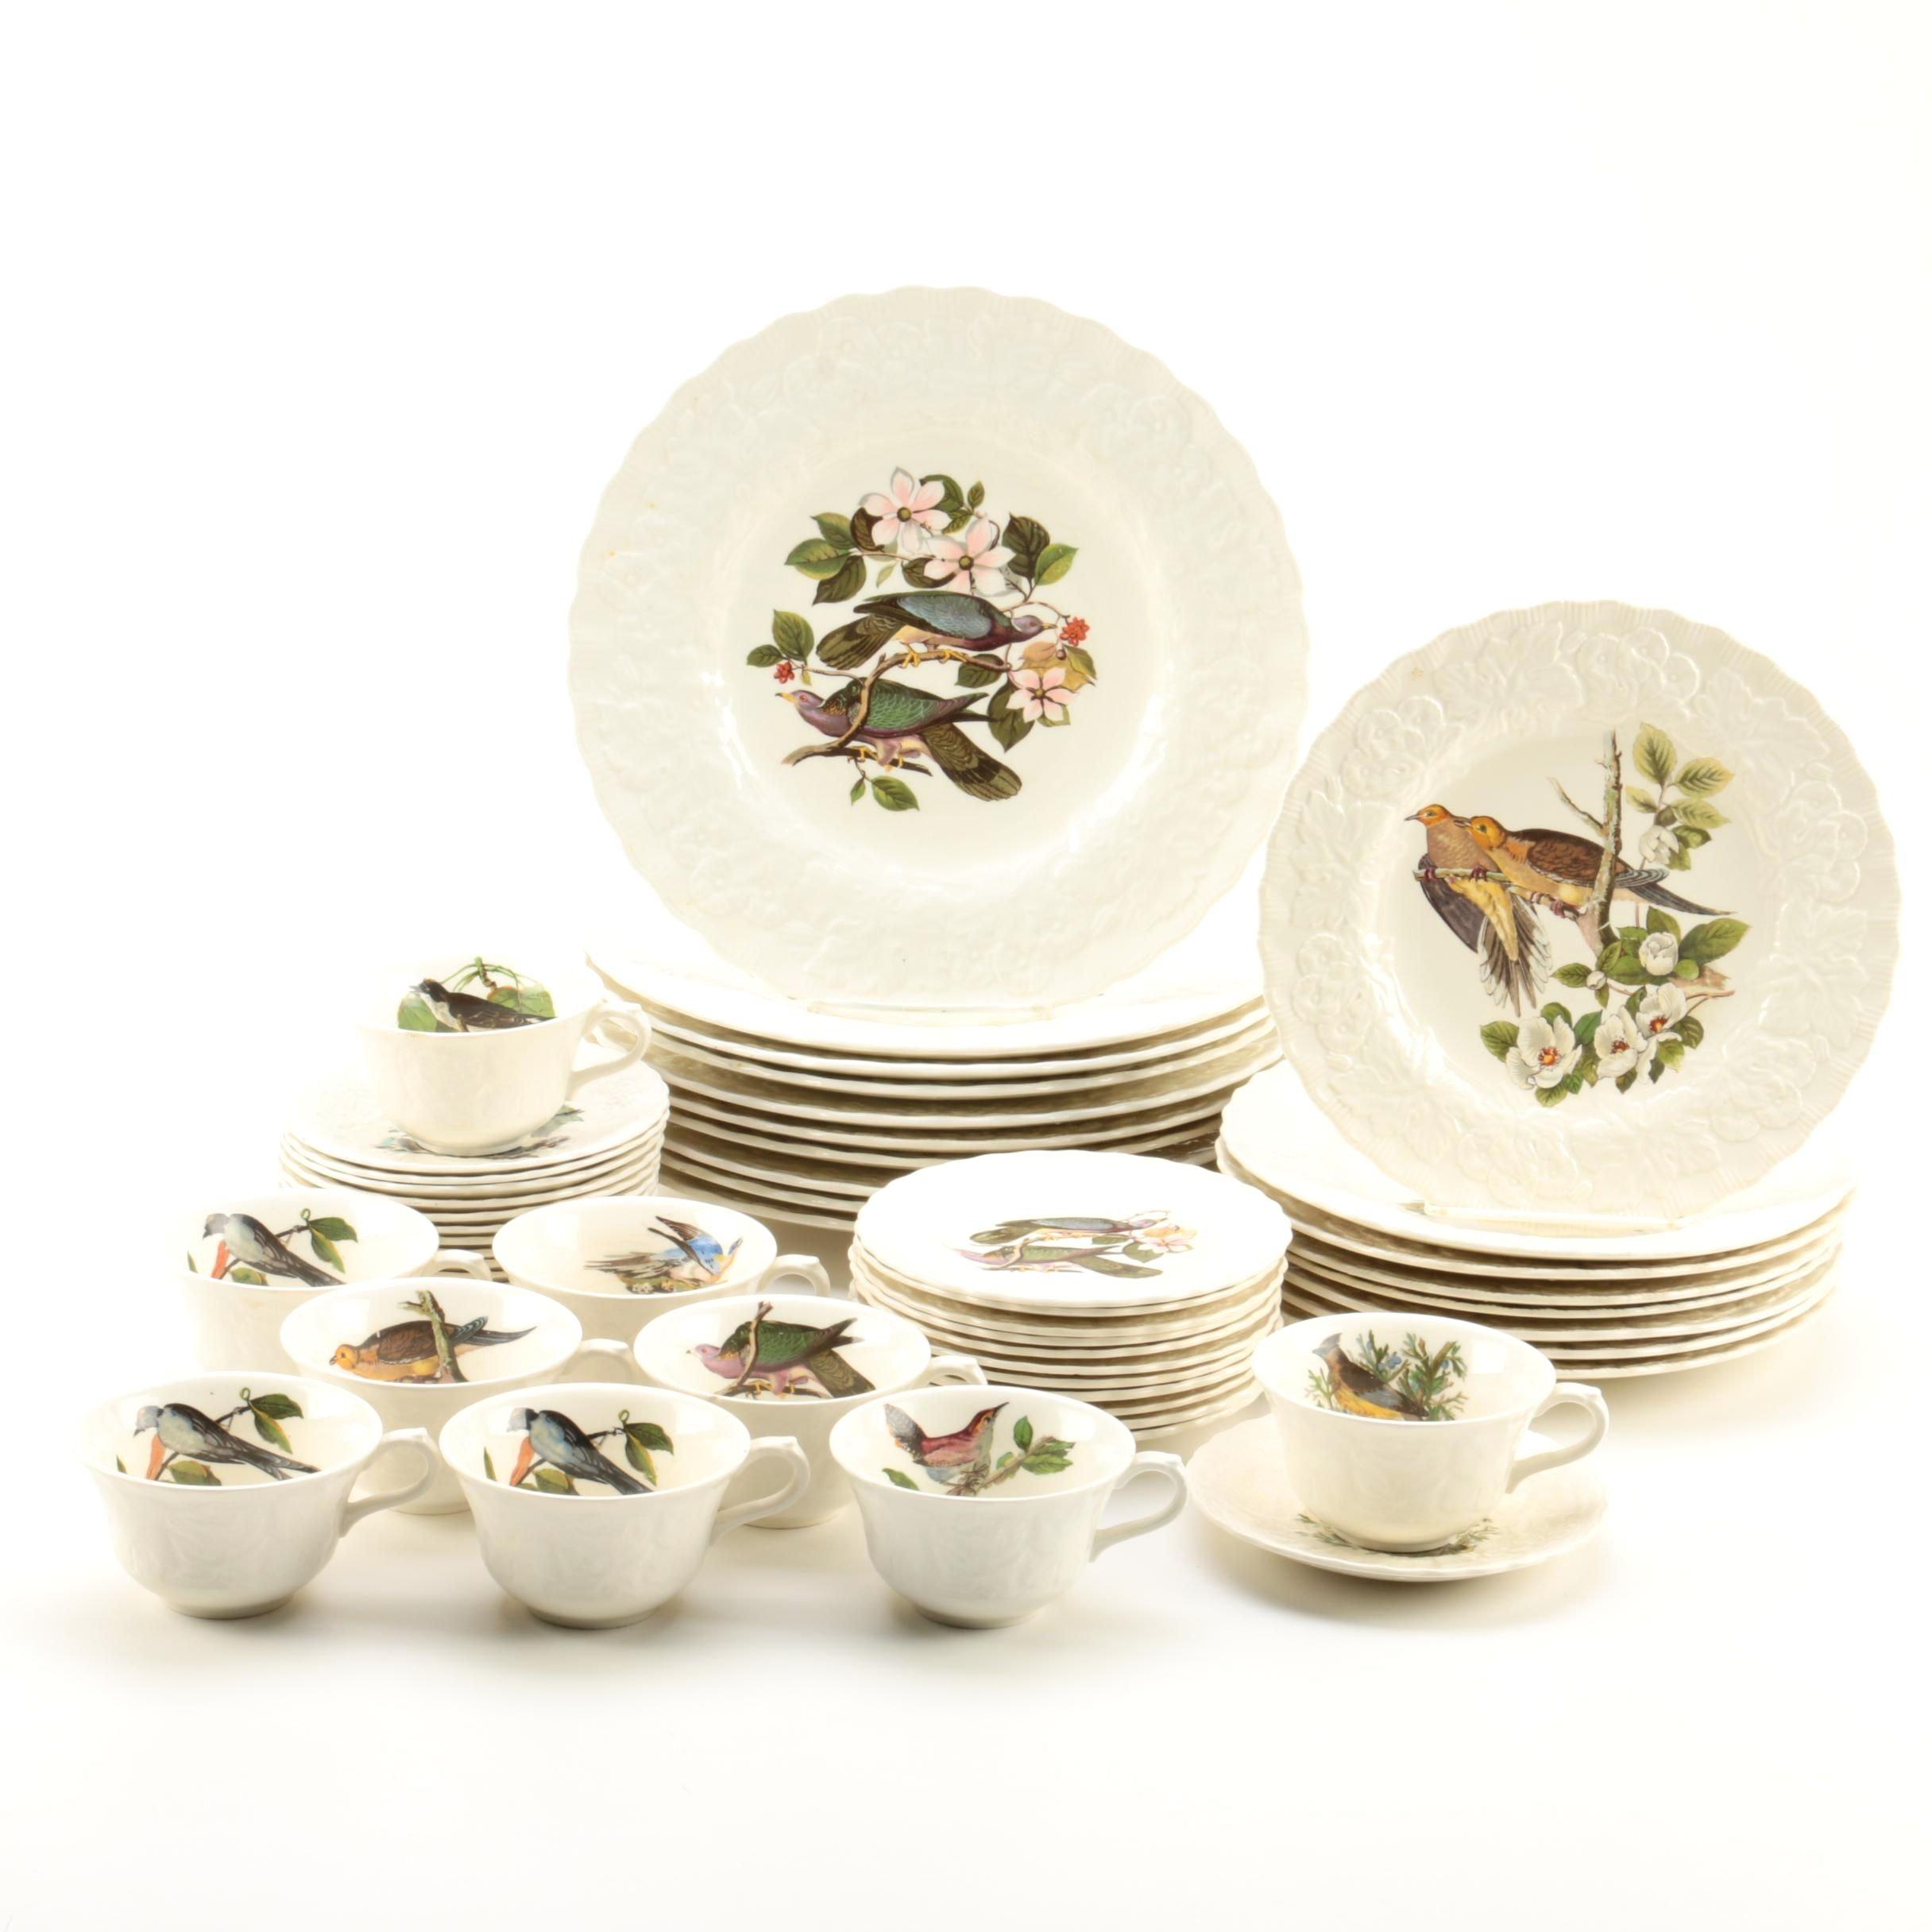 Vintage Alfred Meakin Audubon \ Birds of America\  Dinnerware ...  sc 1 st  EBTH.com & Vintage Alfred Meakin Audubon \